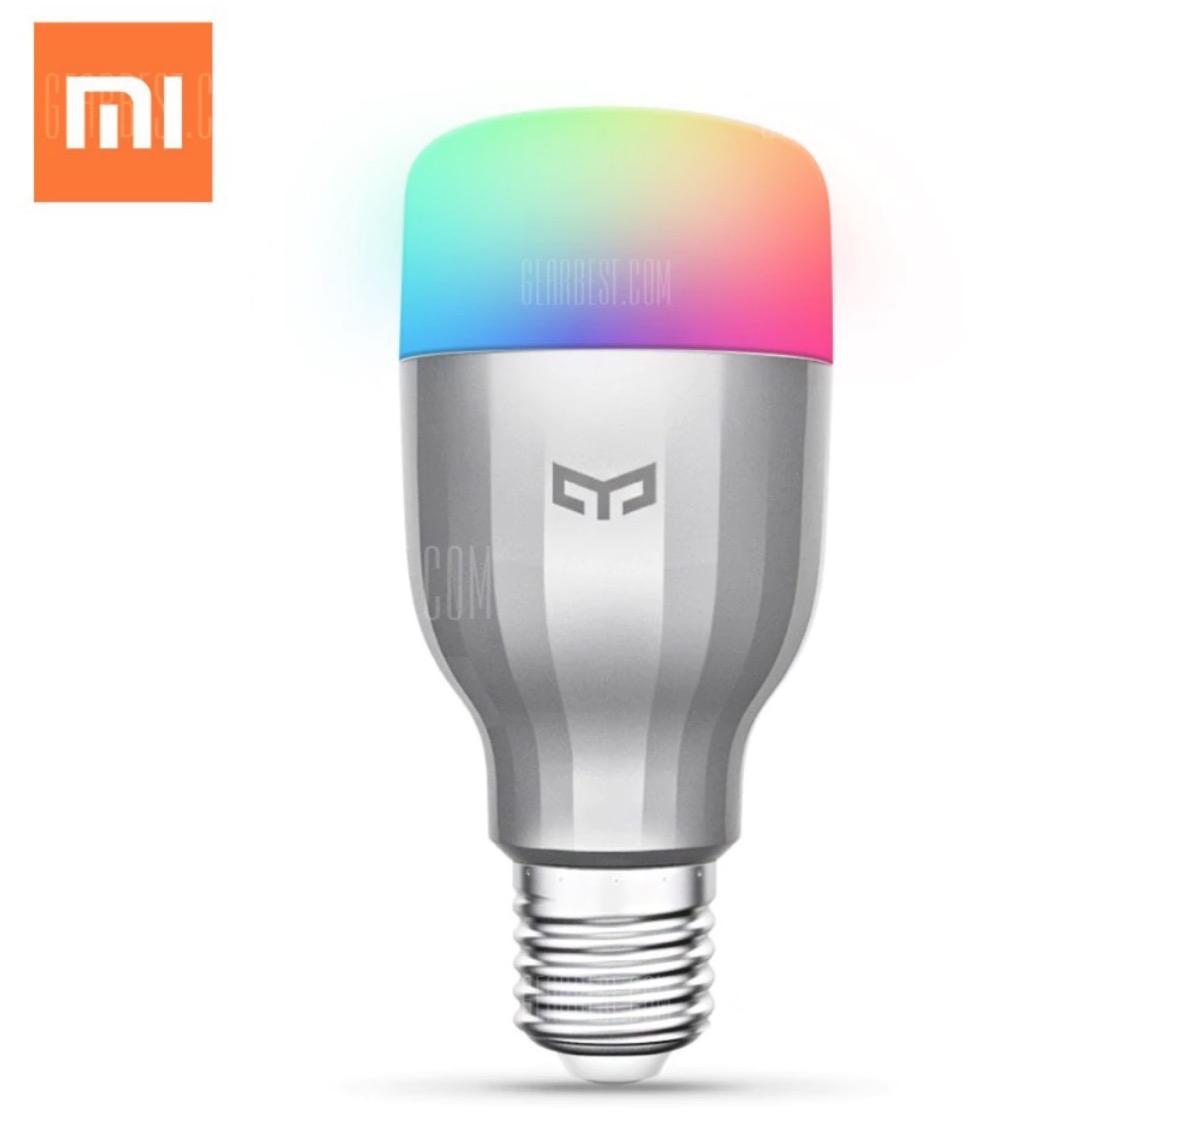 Xiaomi Yeelight La Lampadina Led Smart In Offerta Lampo A